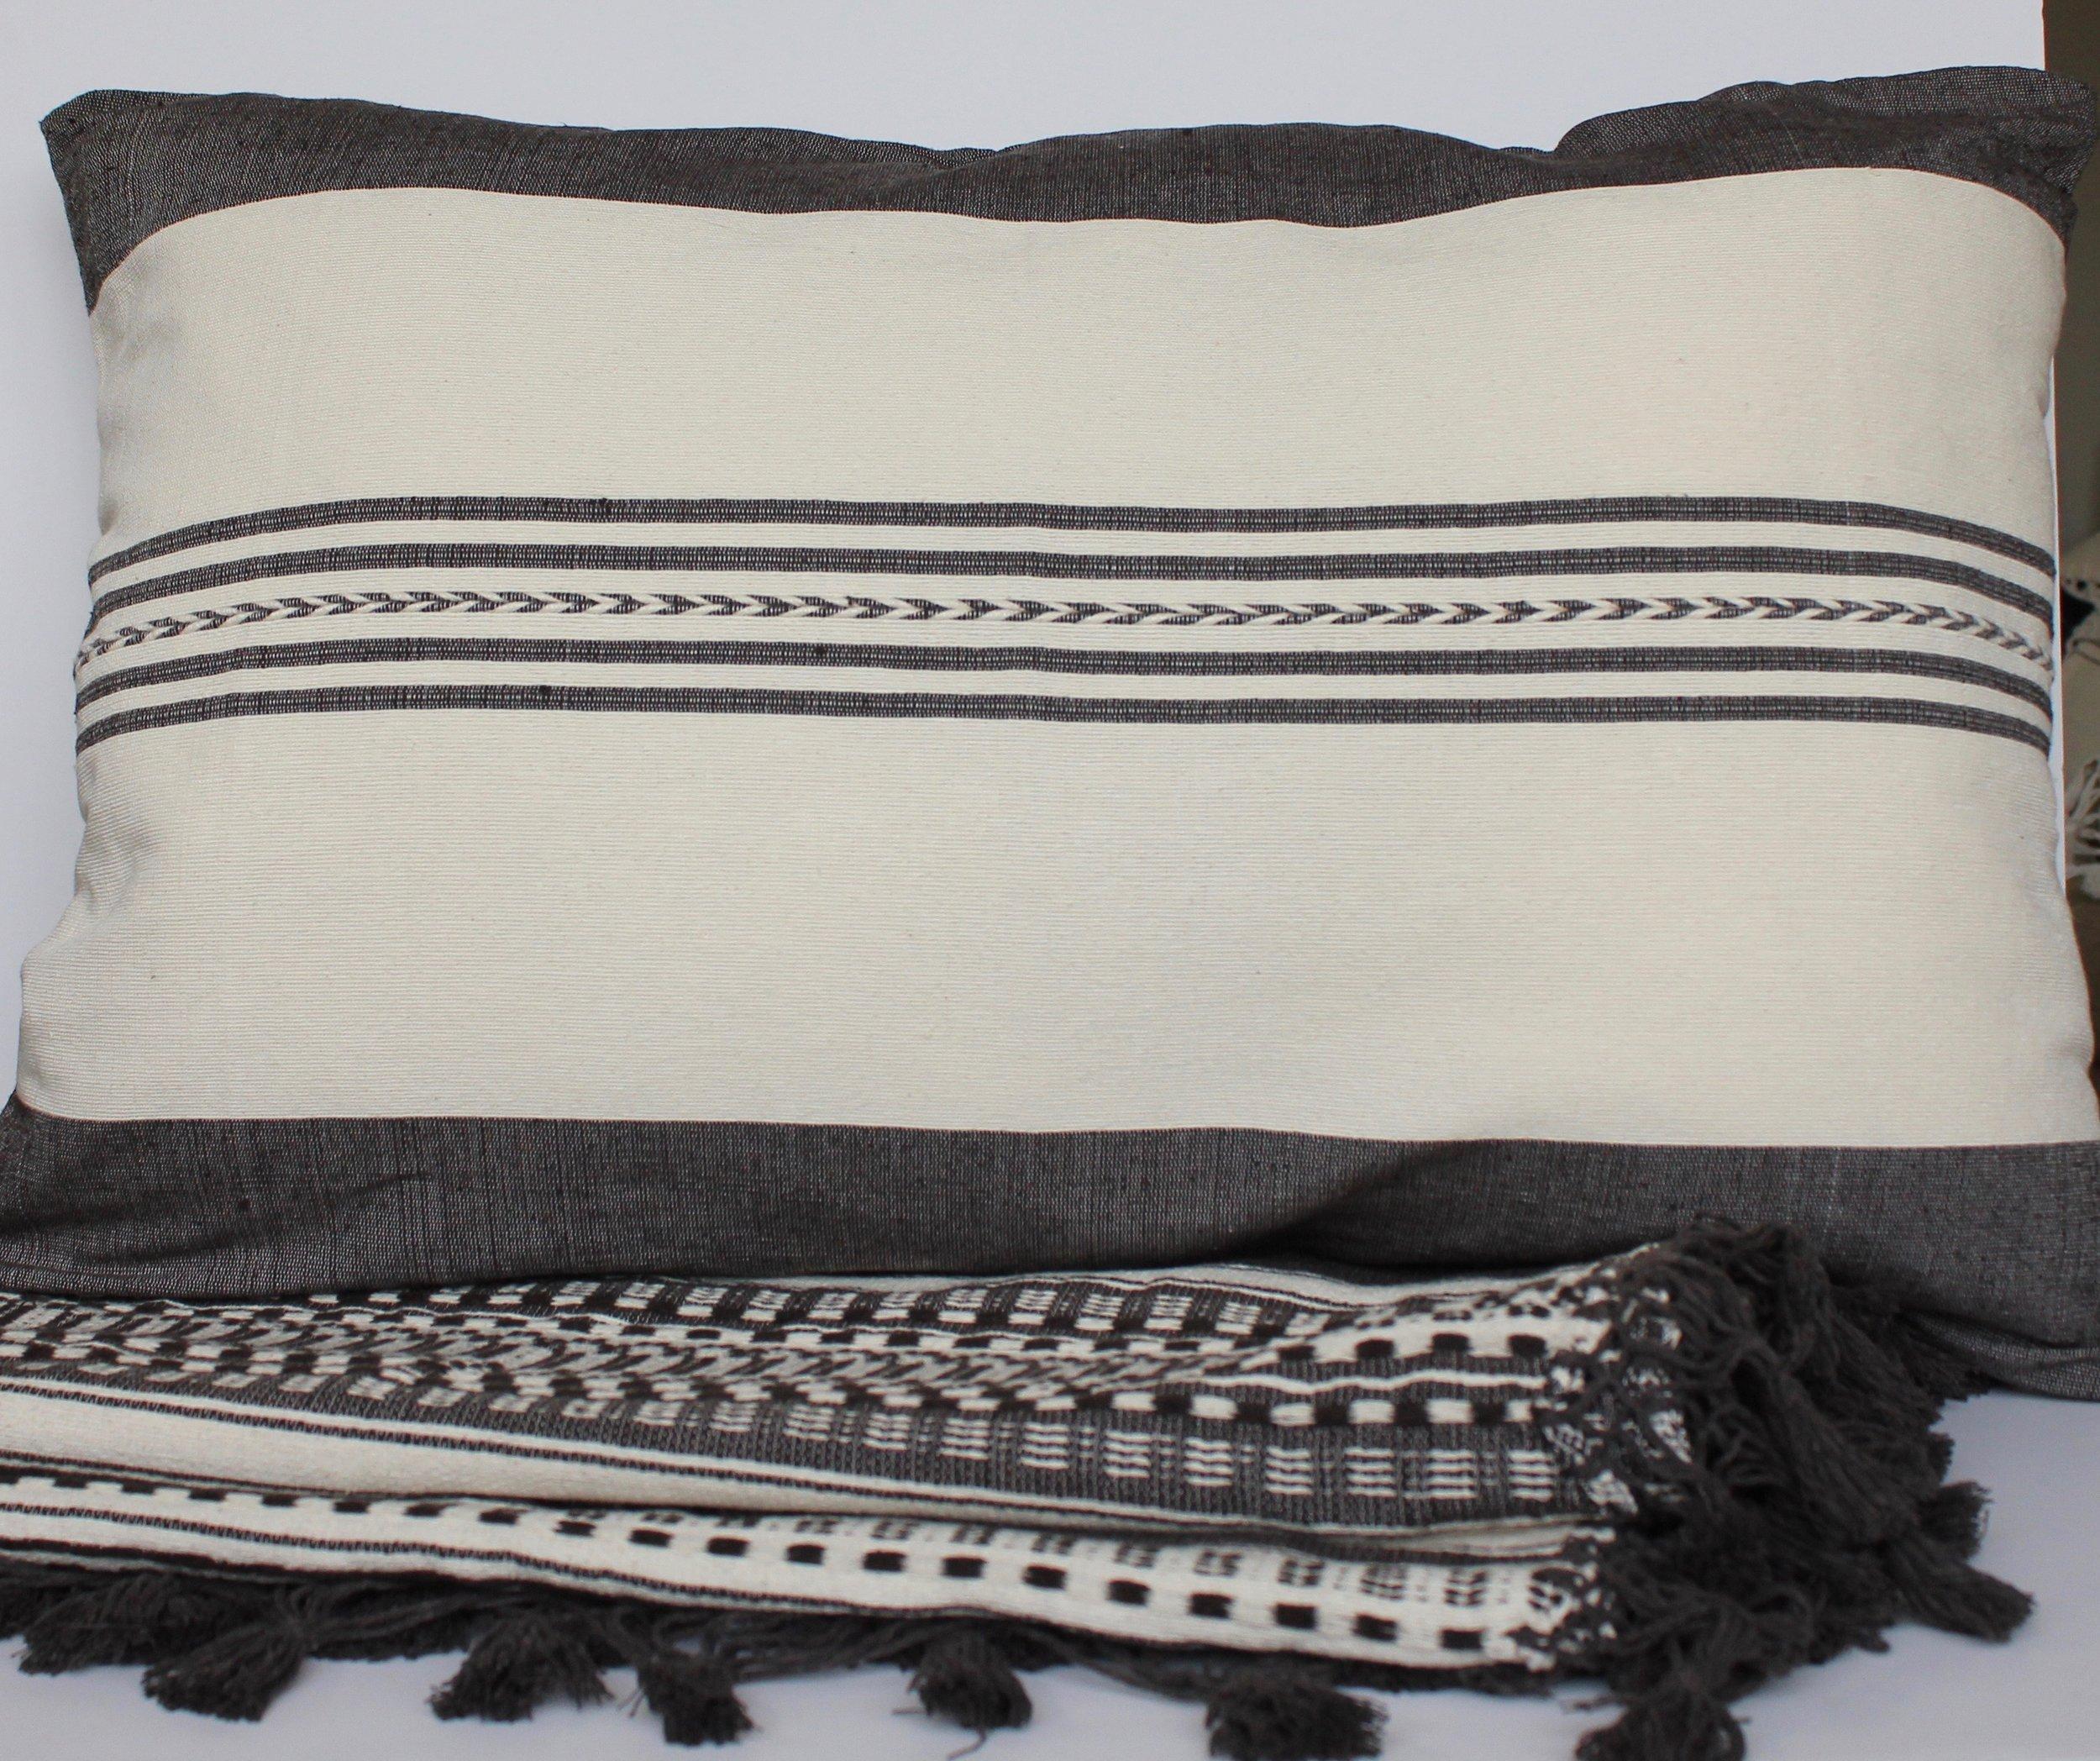 Cushion and cotton throw